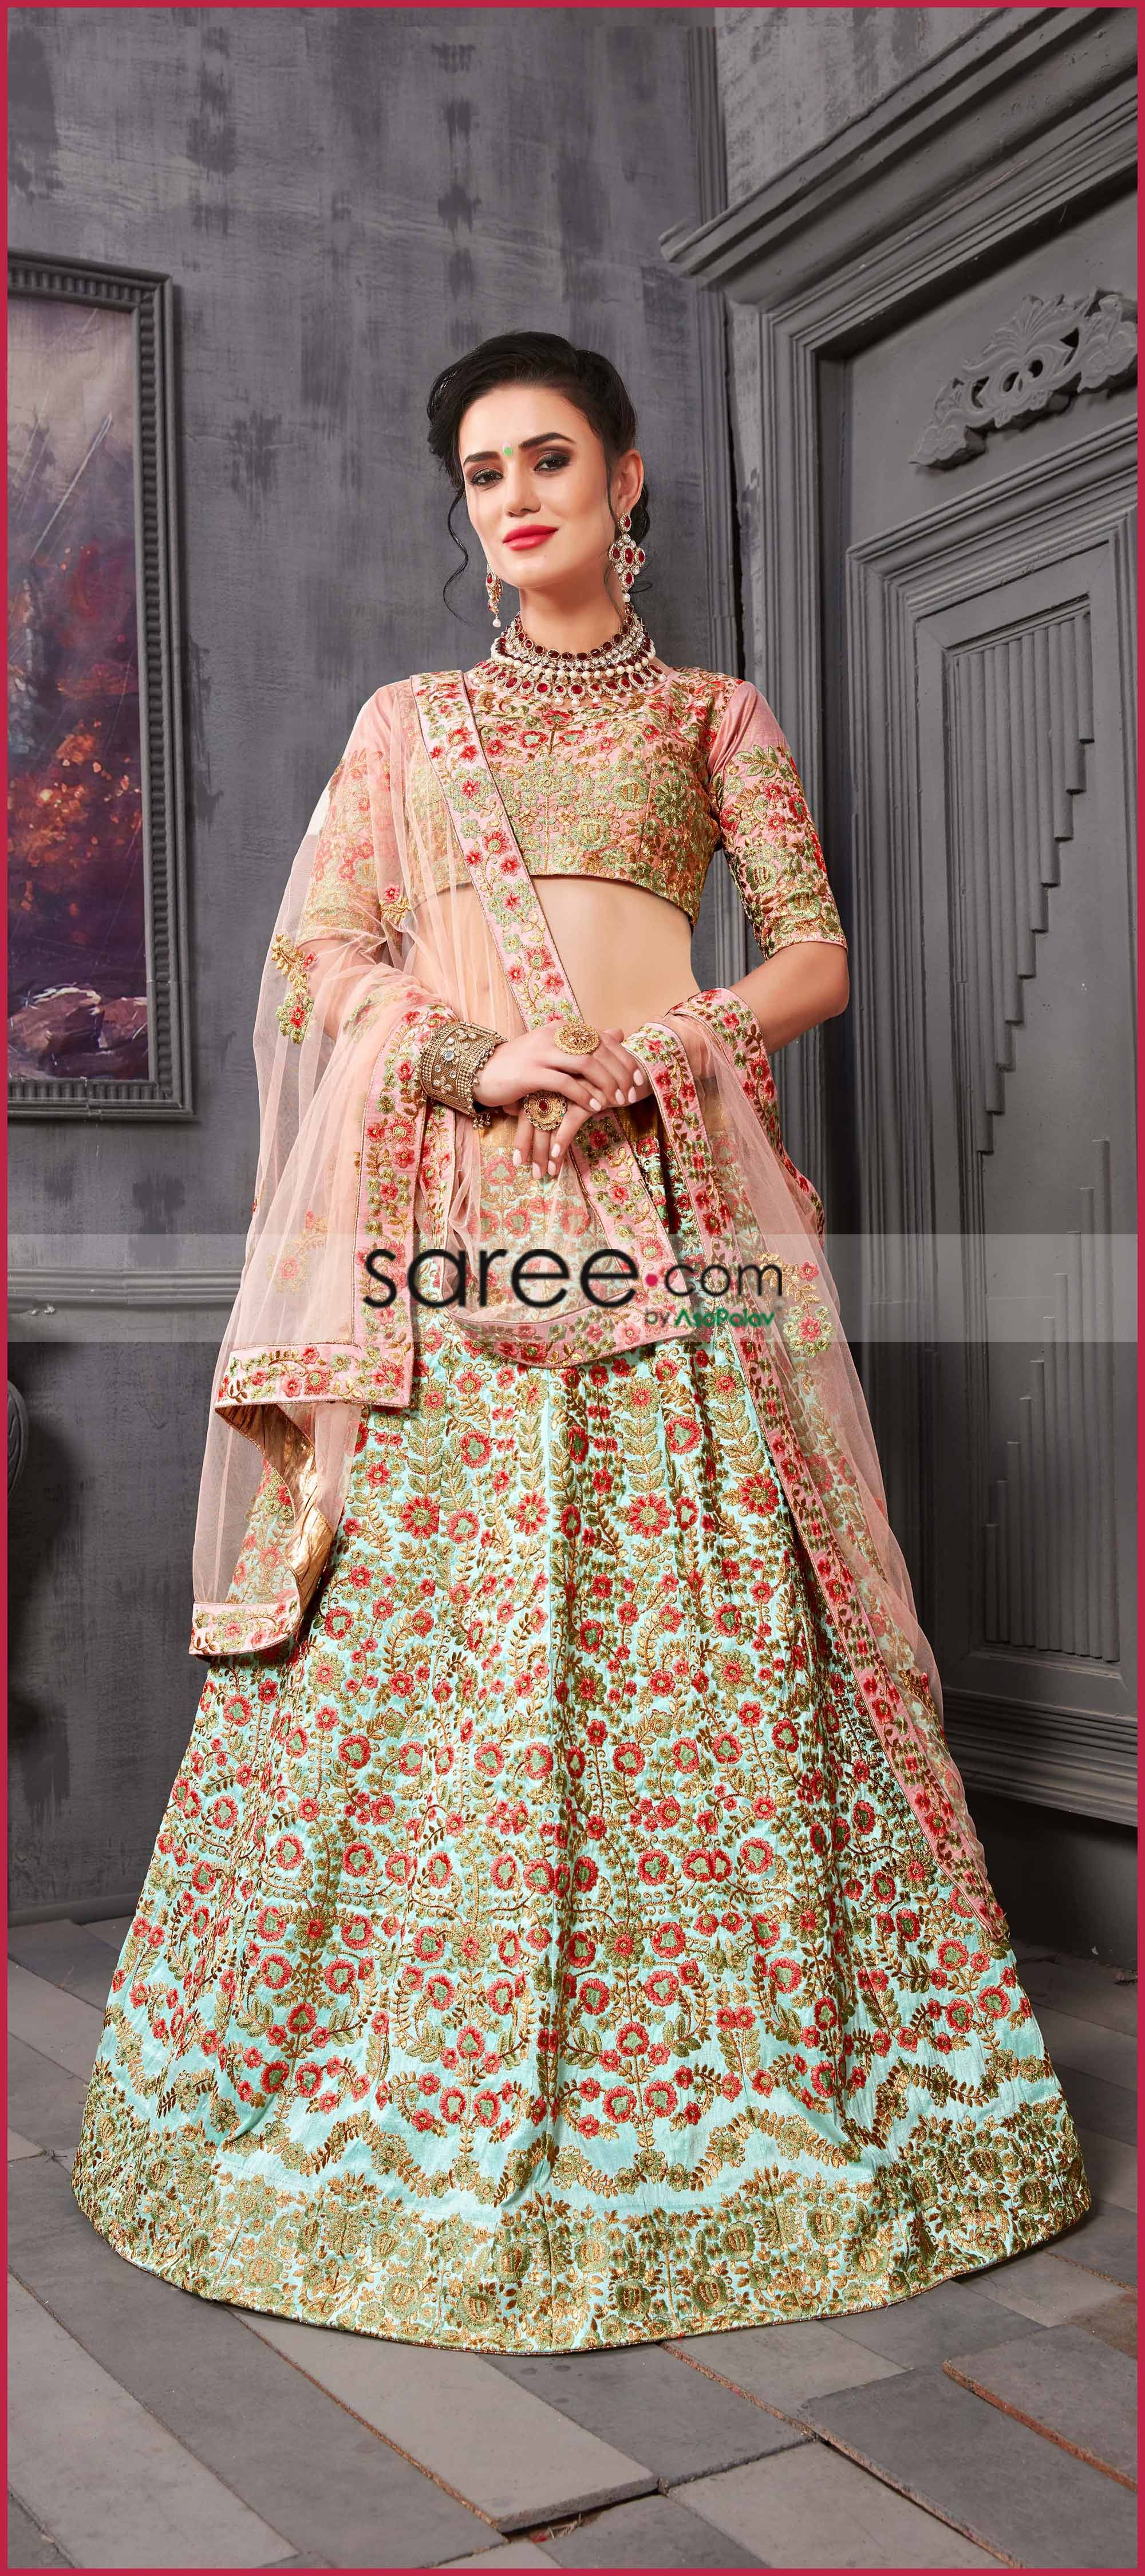 3e7a25b5188db5 Sky Blue Silk Designer Lehenga Choli with Zari Embroidery | Bridal ...